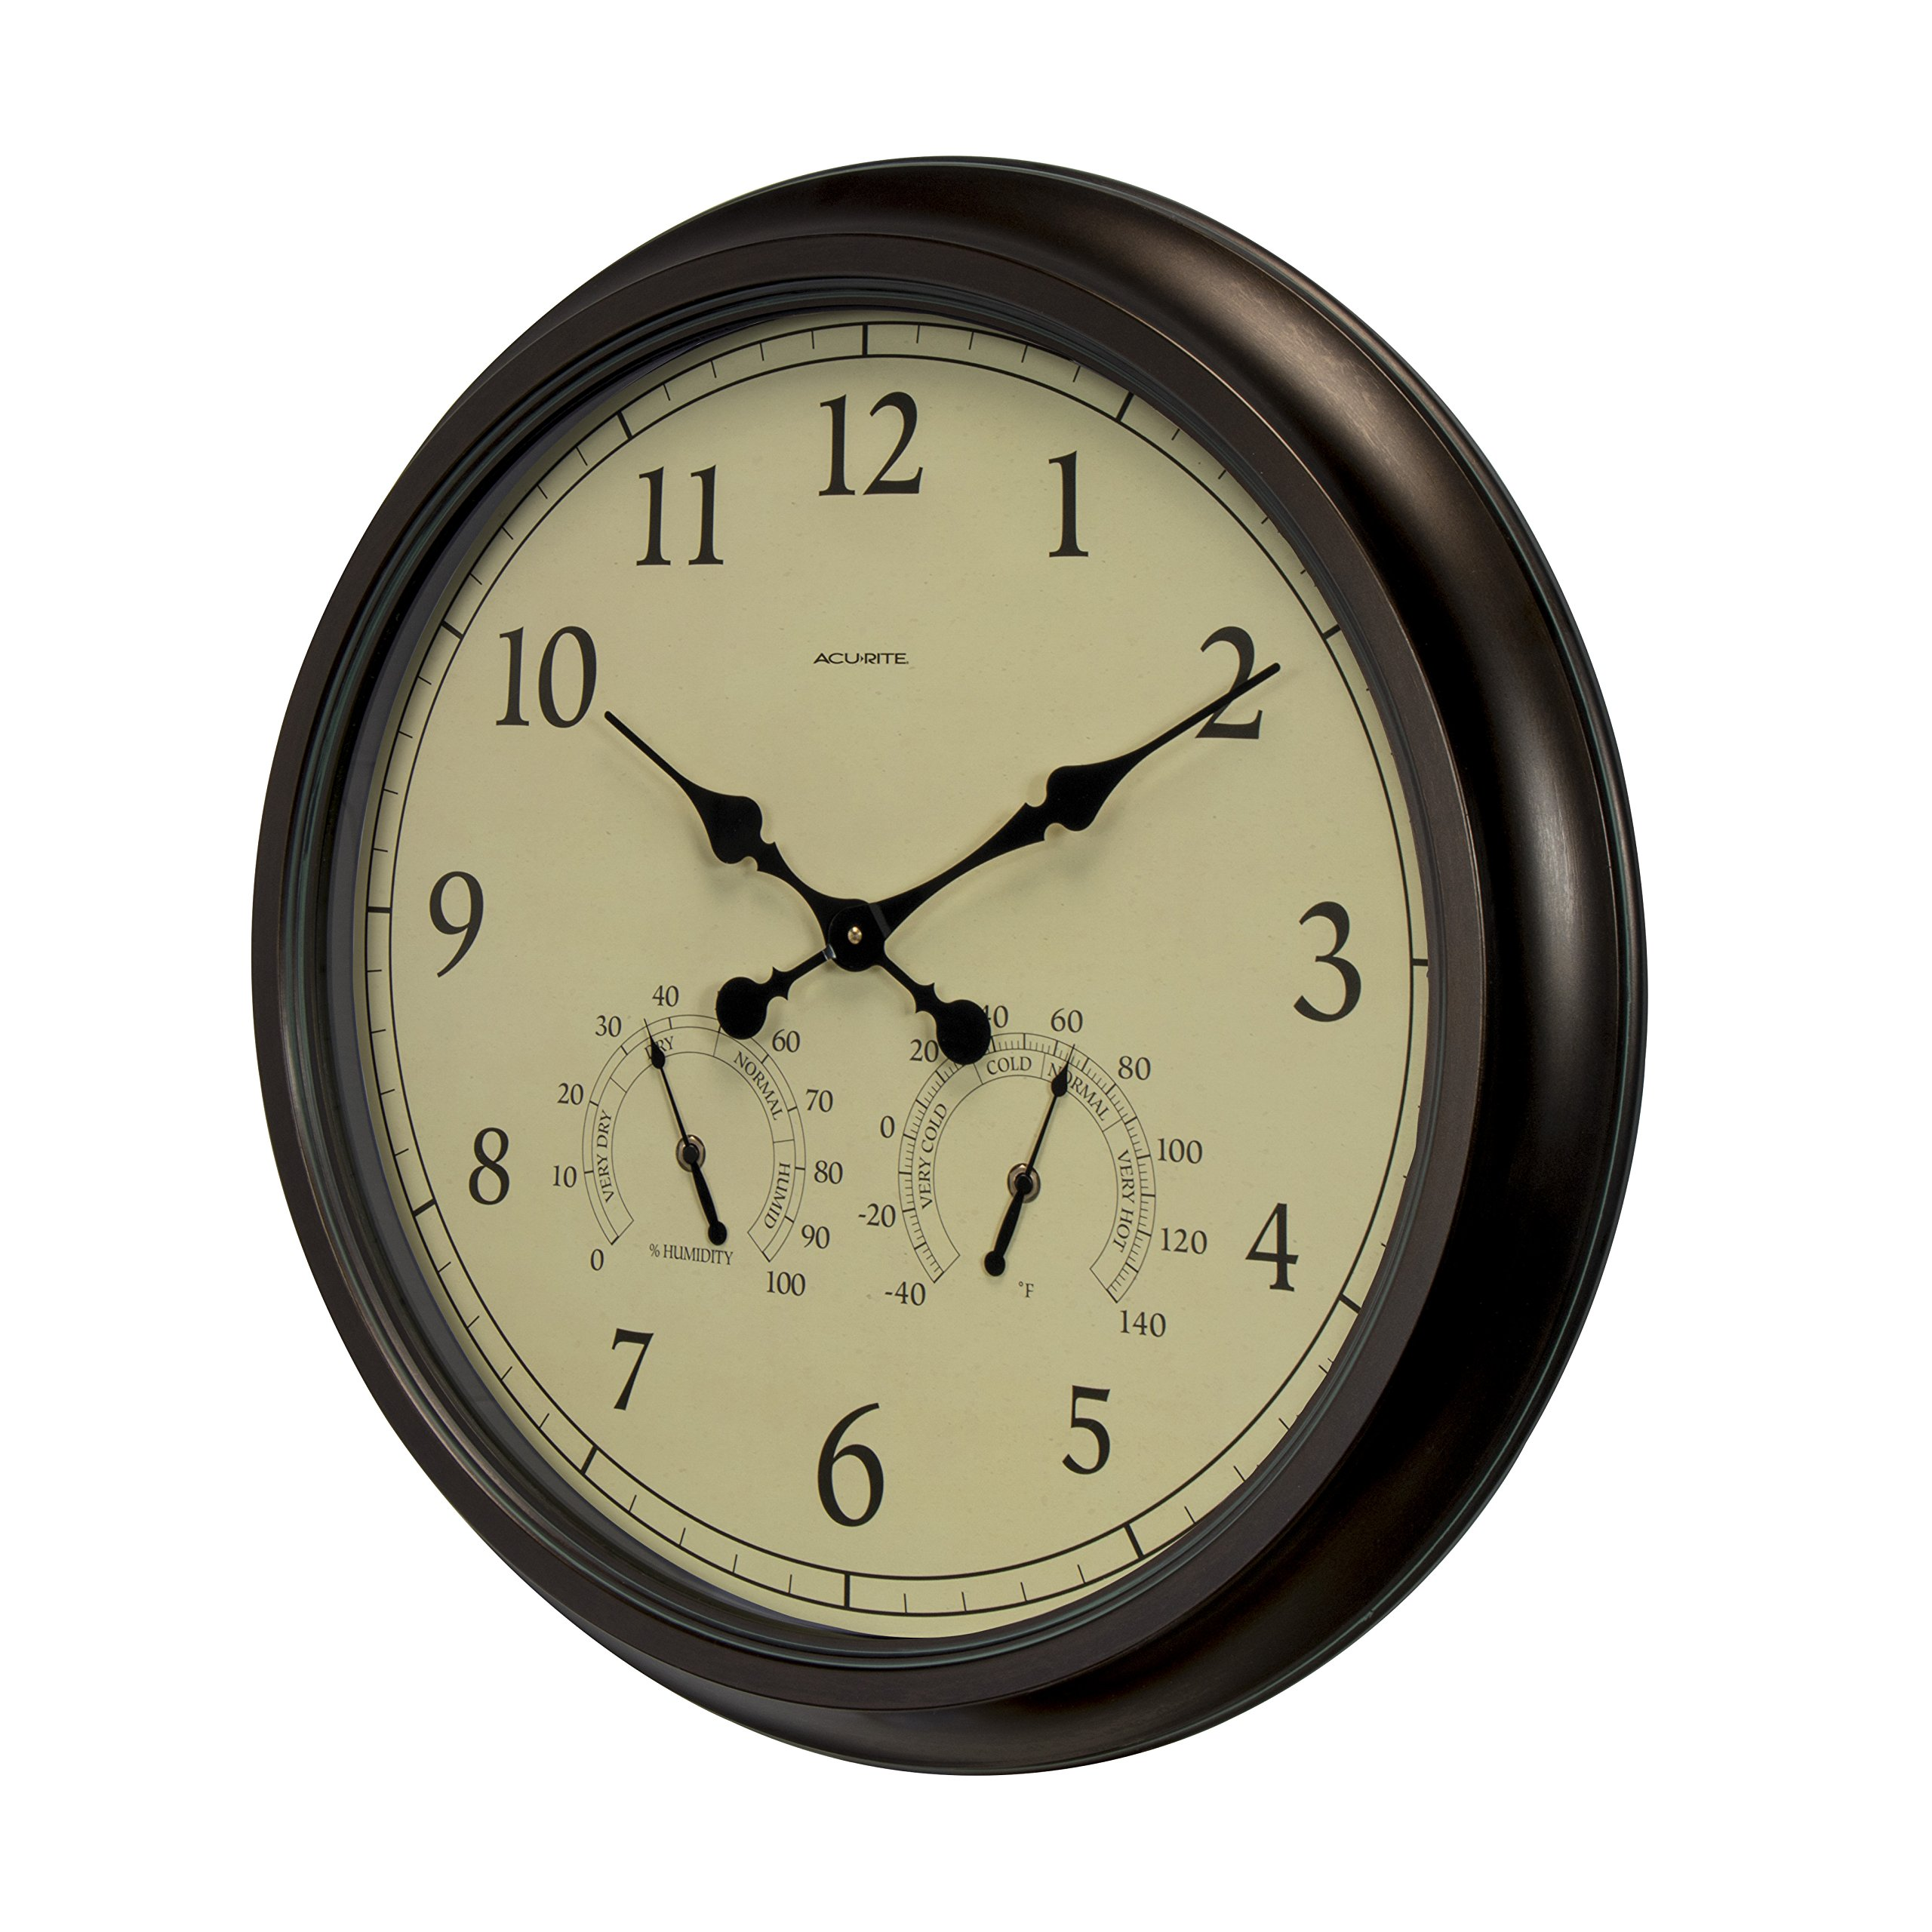 Acurite 01061 24 Inch Patina Indooroutdoor Wall Clock With